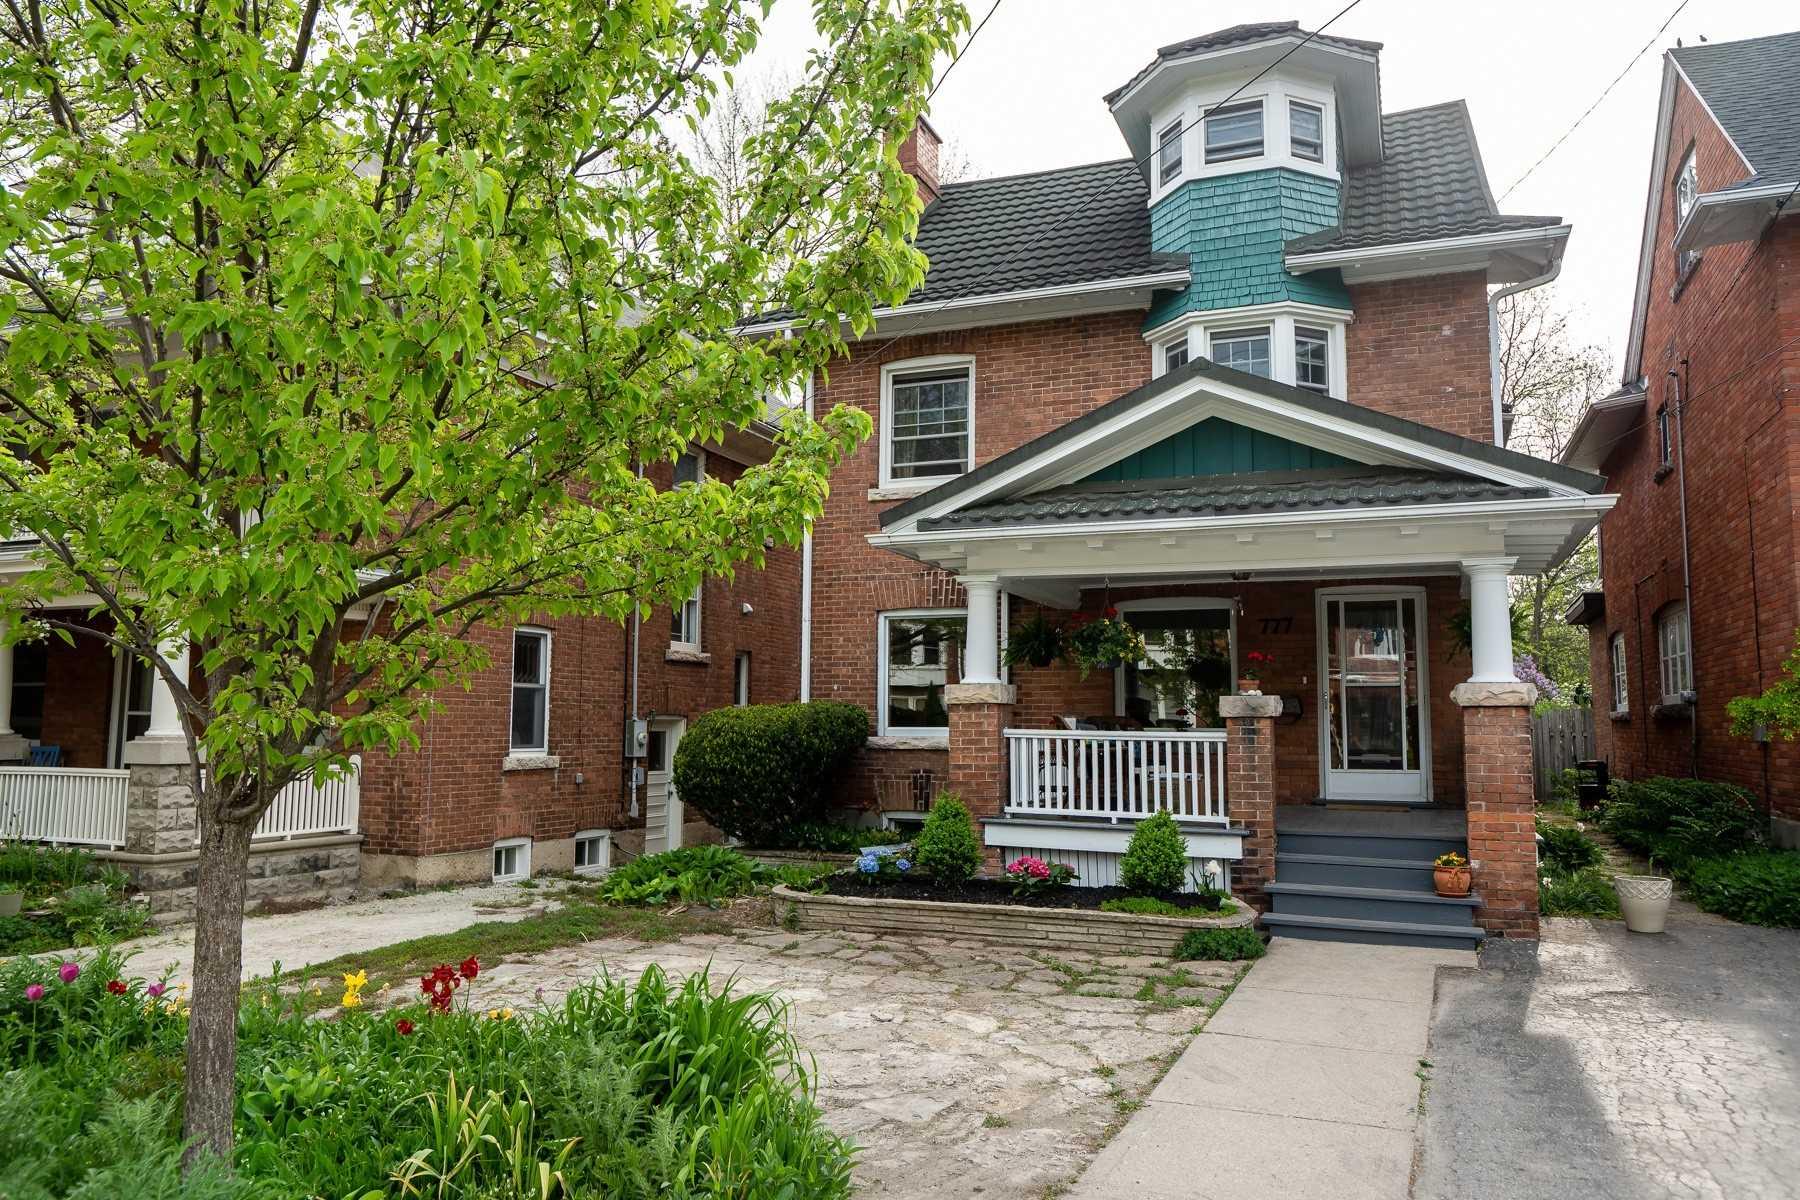 777 2nd Ave, Owen Sound, Ontario N4K 4M2, 5 Bedrooms Bedrooms, ,3 BathroomsBathrooms,Detached,For Sale,2nd,X5272614